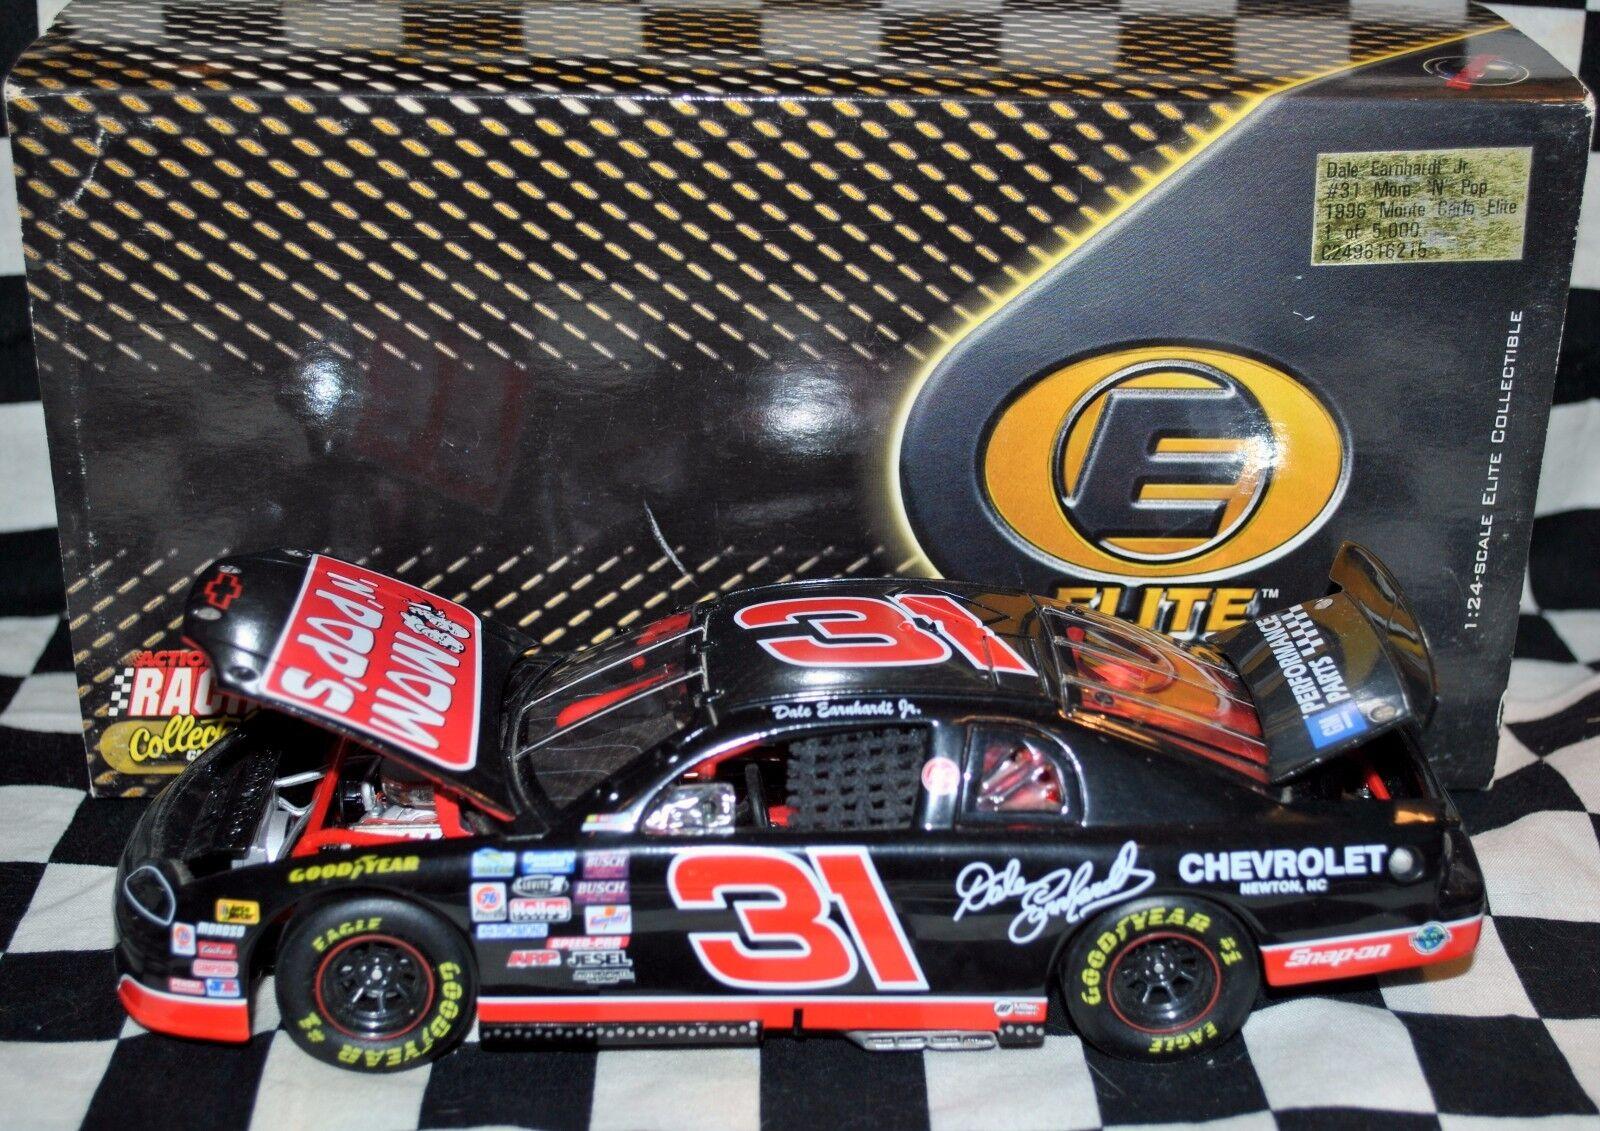 DALE EARNHARDT Jr. 1996 MOM & POP  ELITE 1 24 DIE CAST Monte Carlo NASCAR